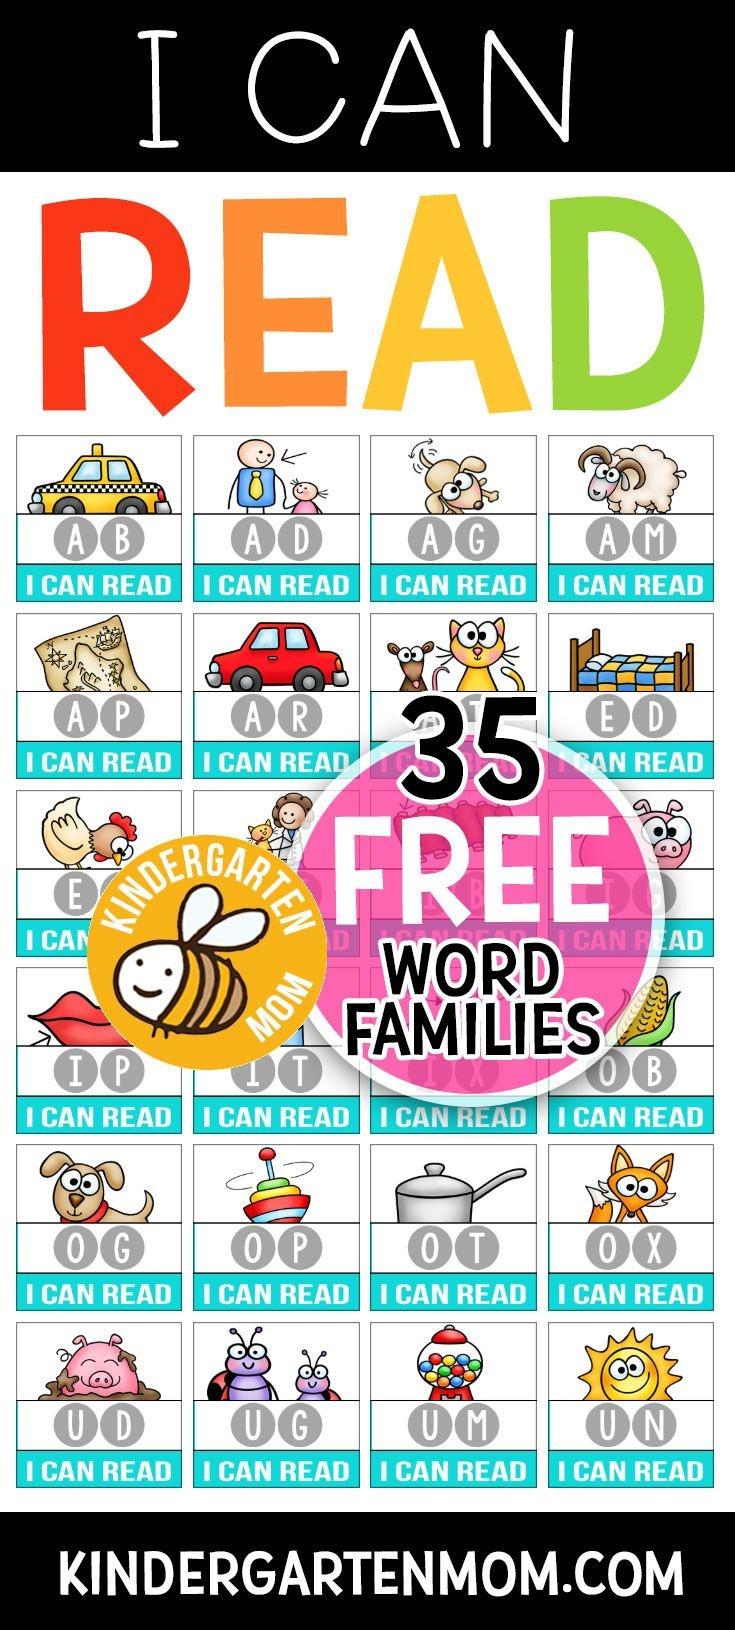 Pinthe Crafty Classroom On Homeschool Ninjas | Kindergarten - Free Printable Word Family Mini Books